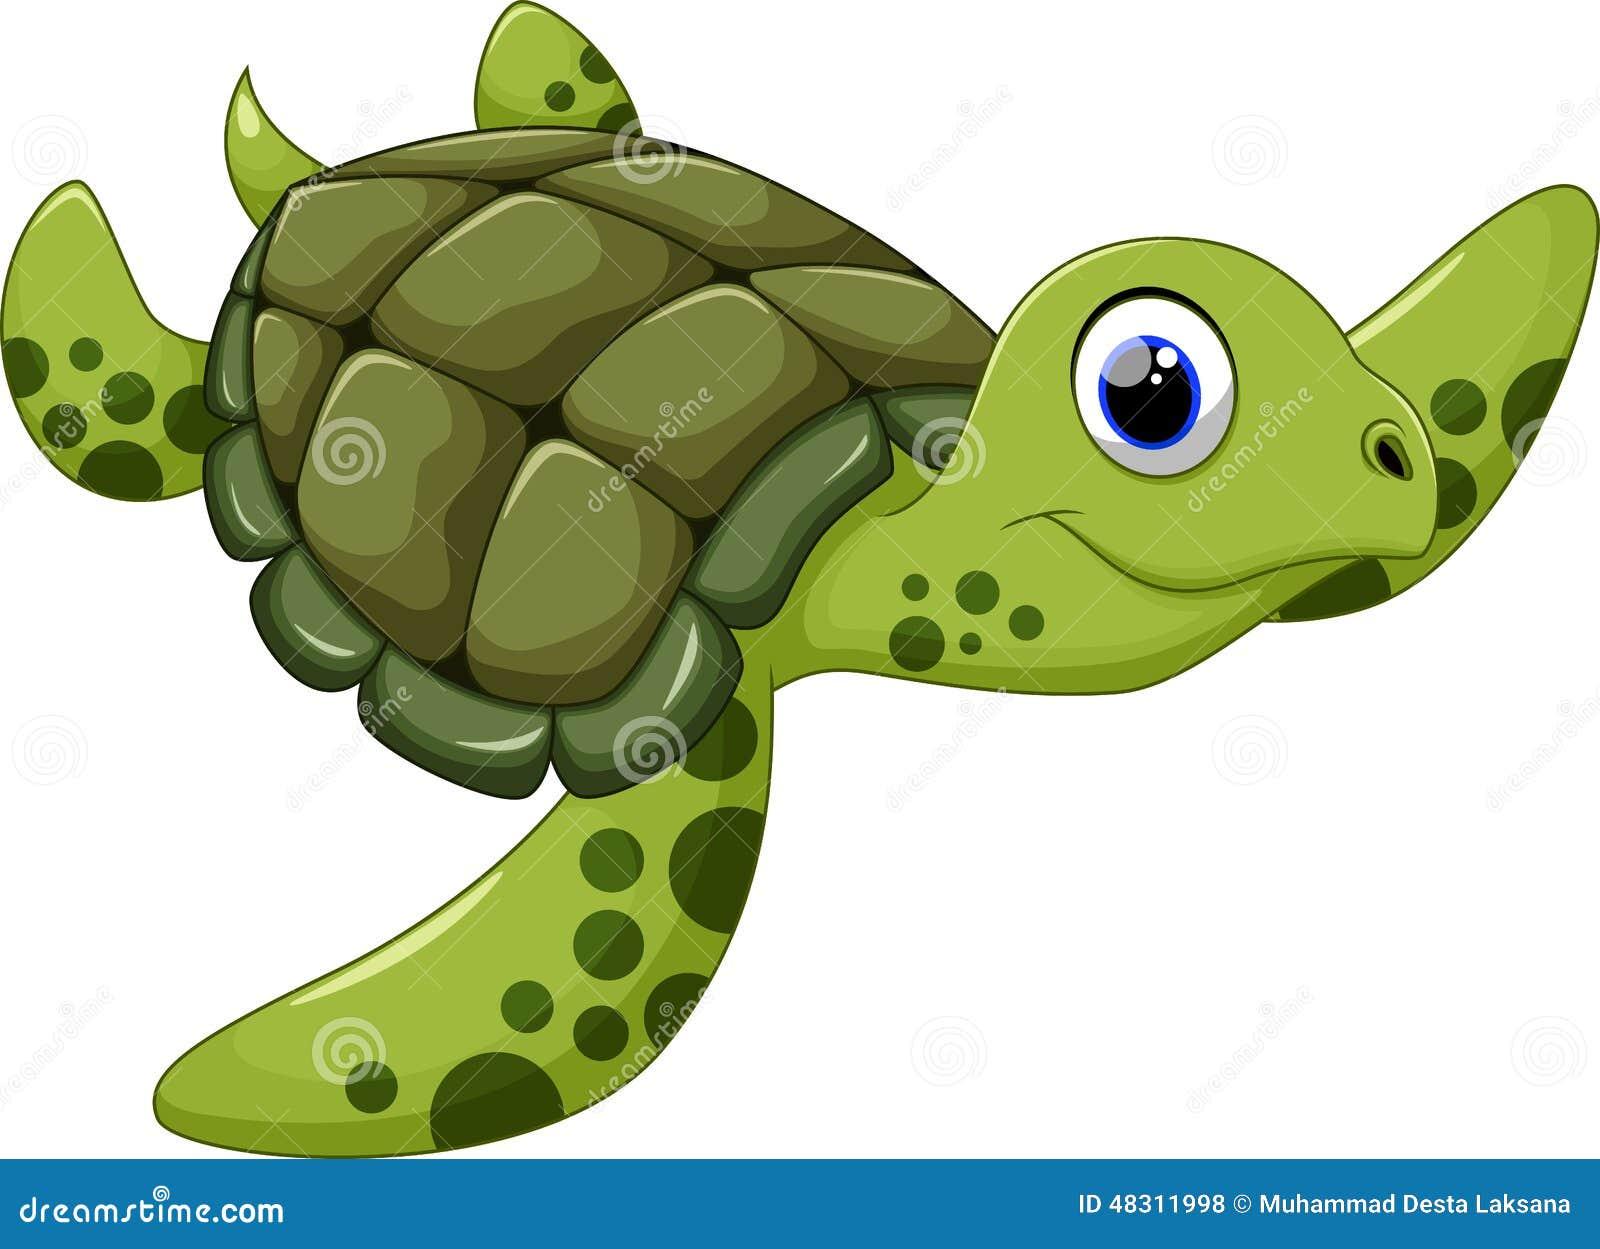 Cute animated sea turtles - photo#13